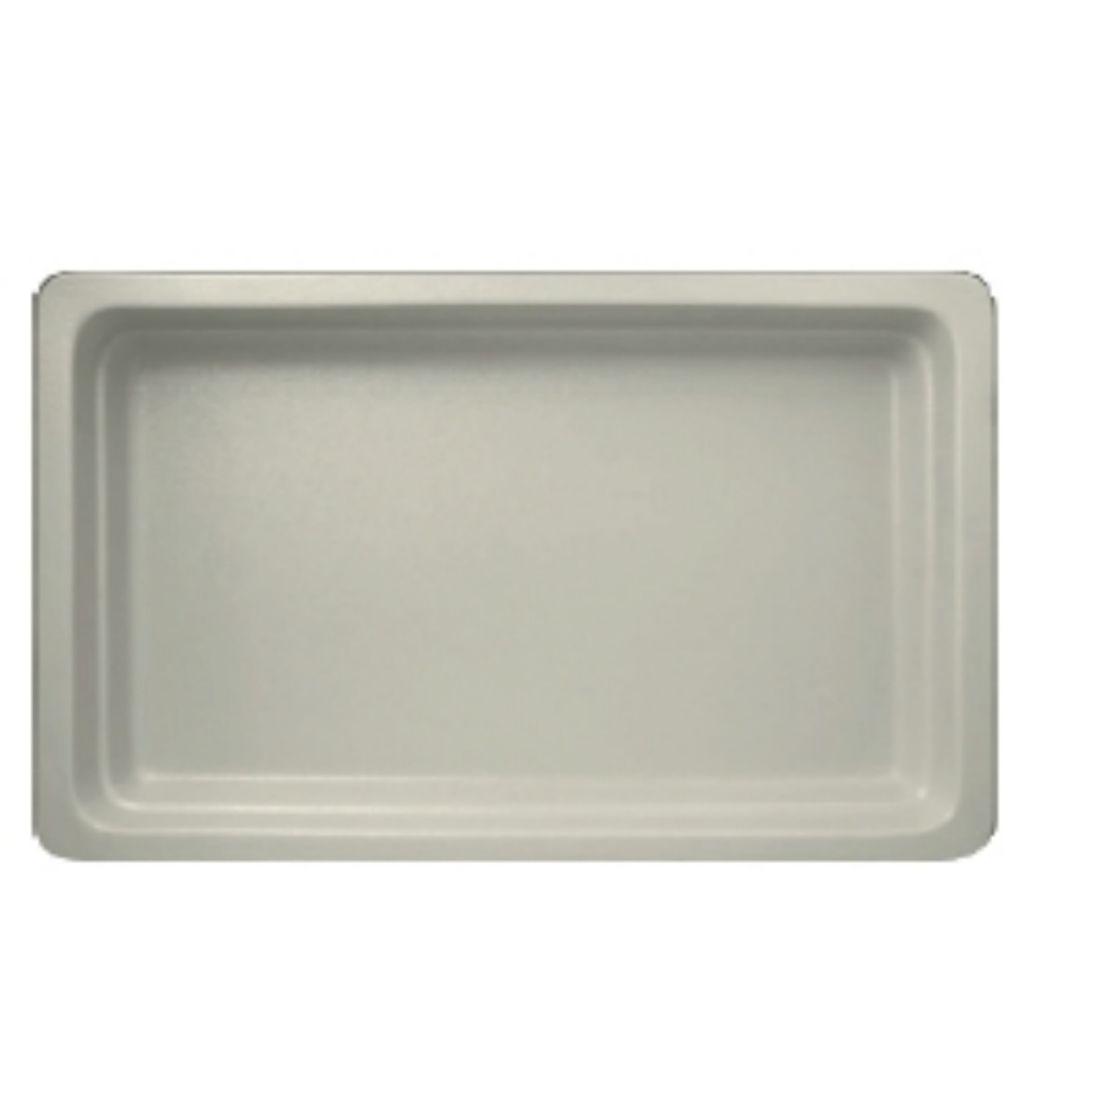 Gastronádoba porcelánová Neofusion GN 1/2 22 mm bílá mat